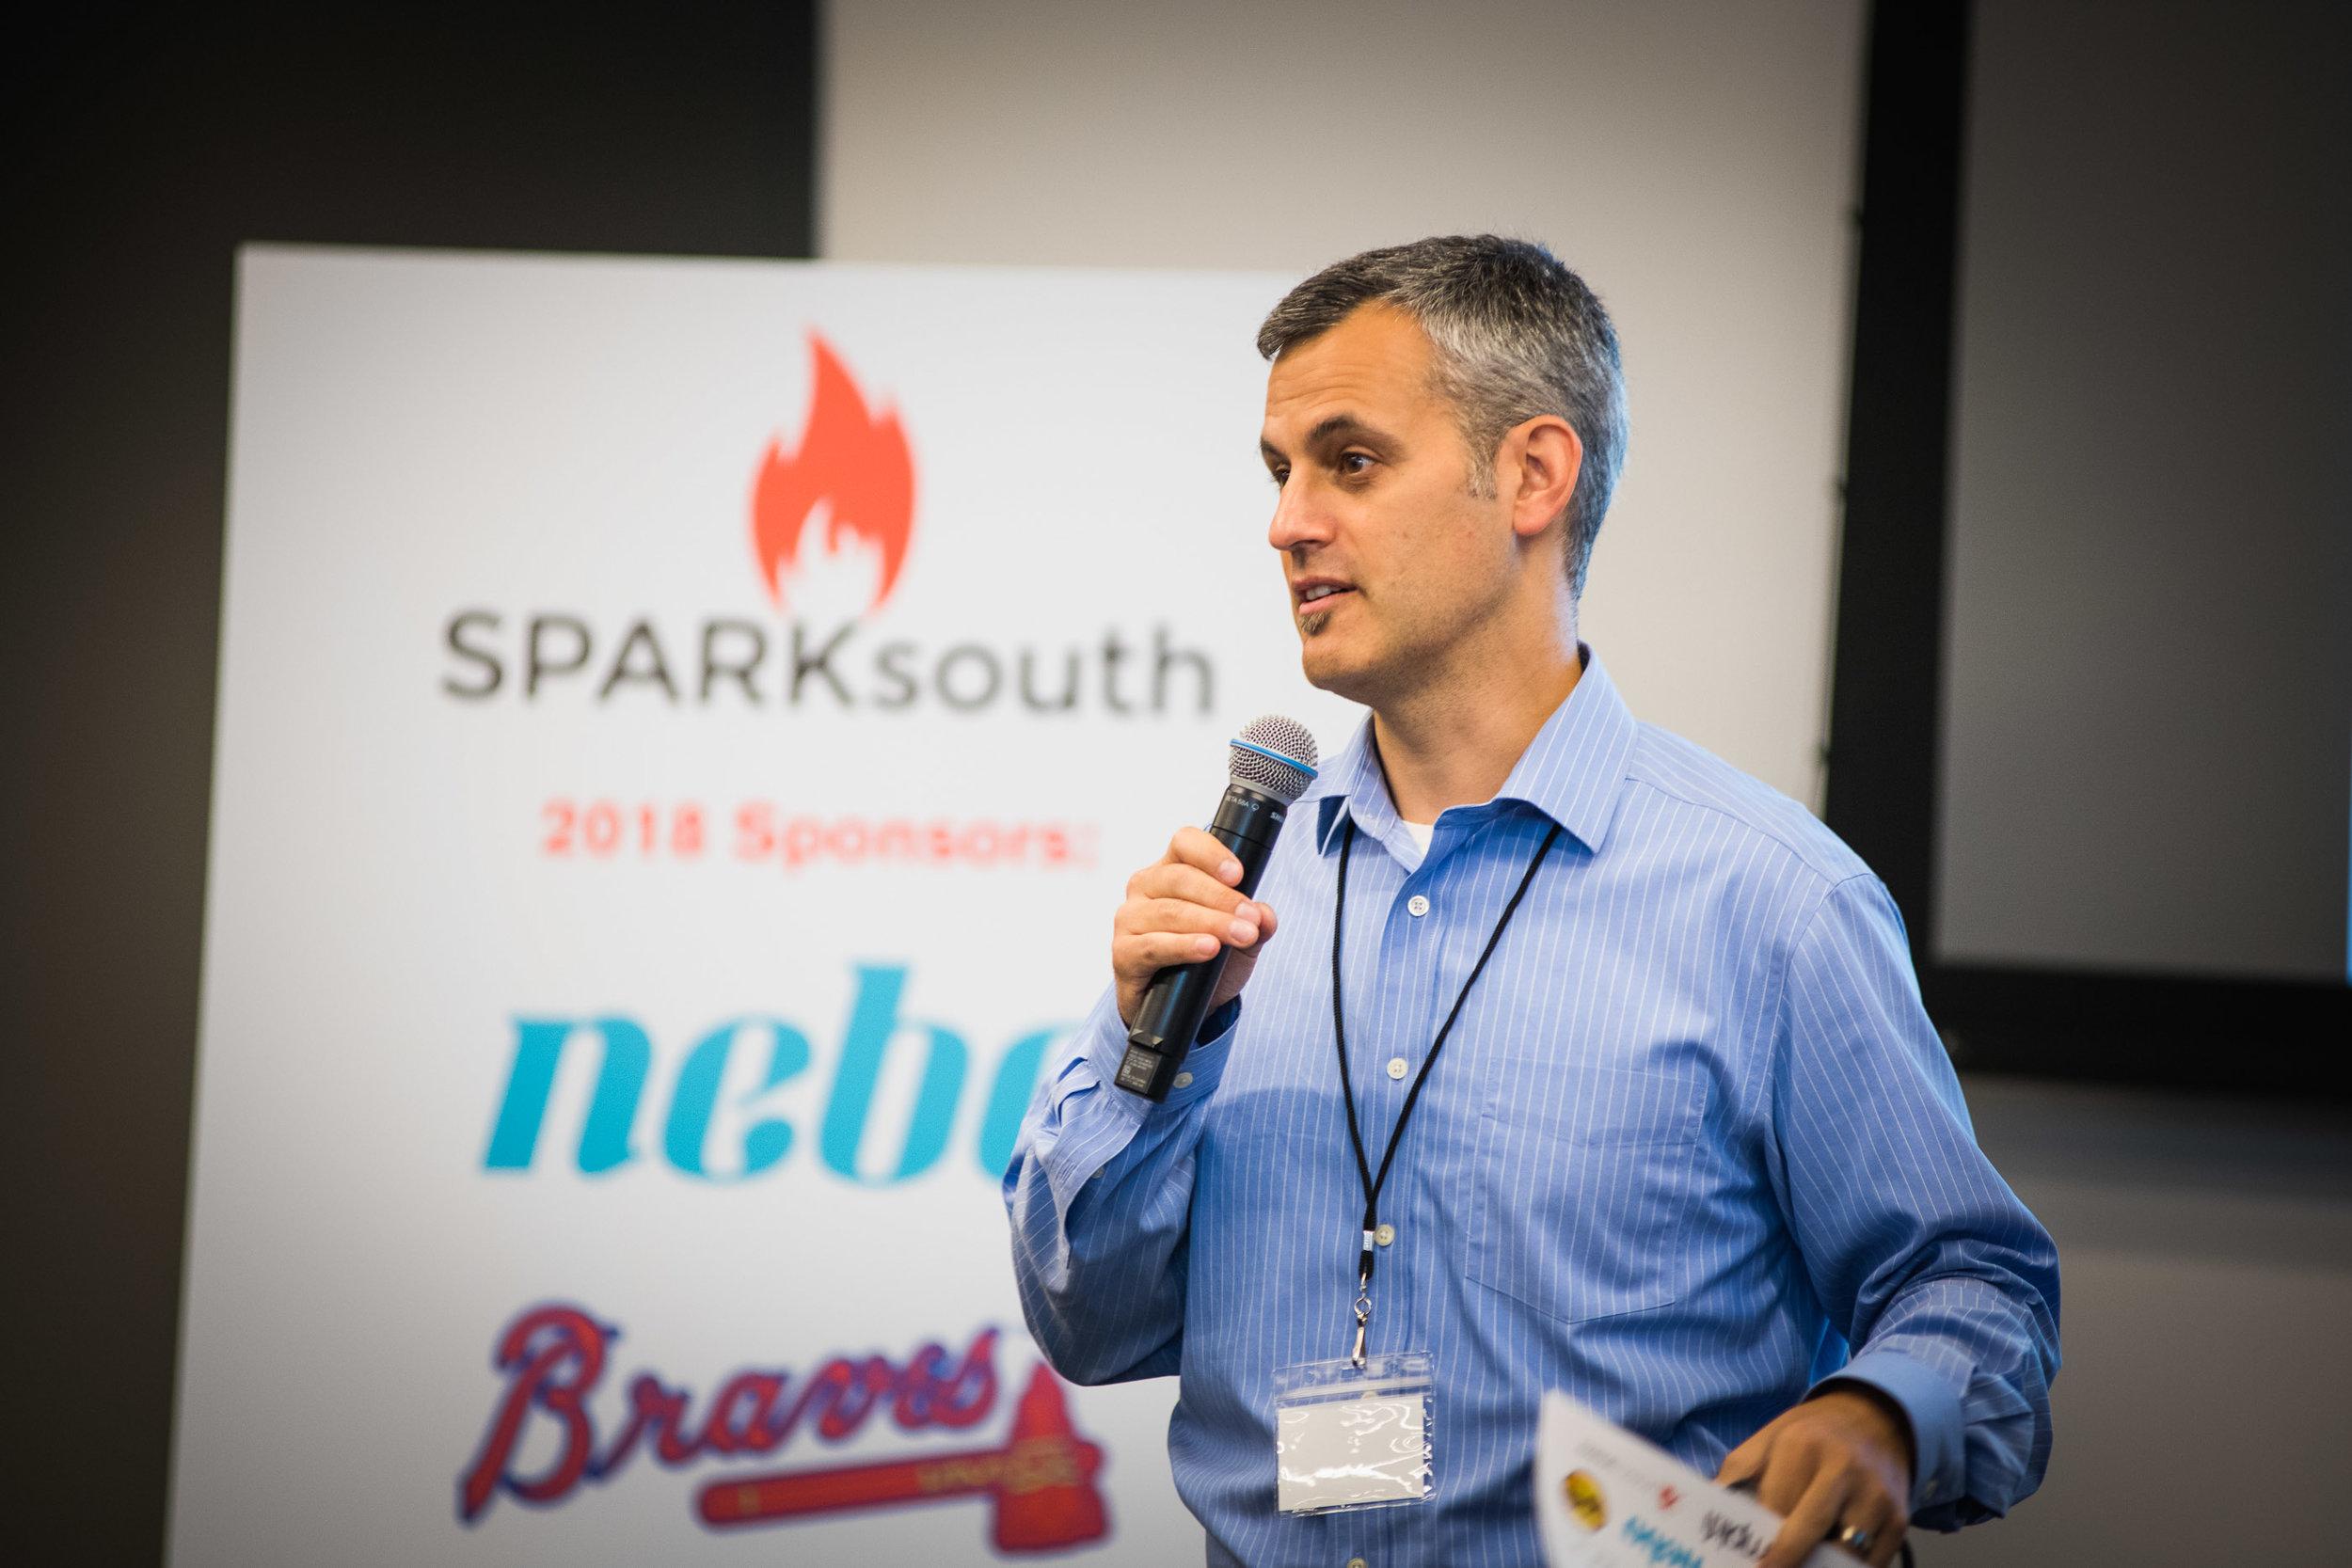 SparkSouth 2018 (web ready)_014.JPG